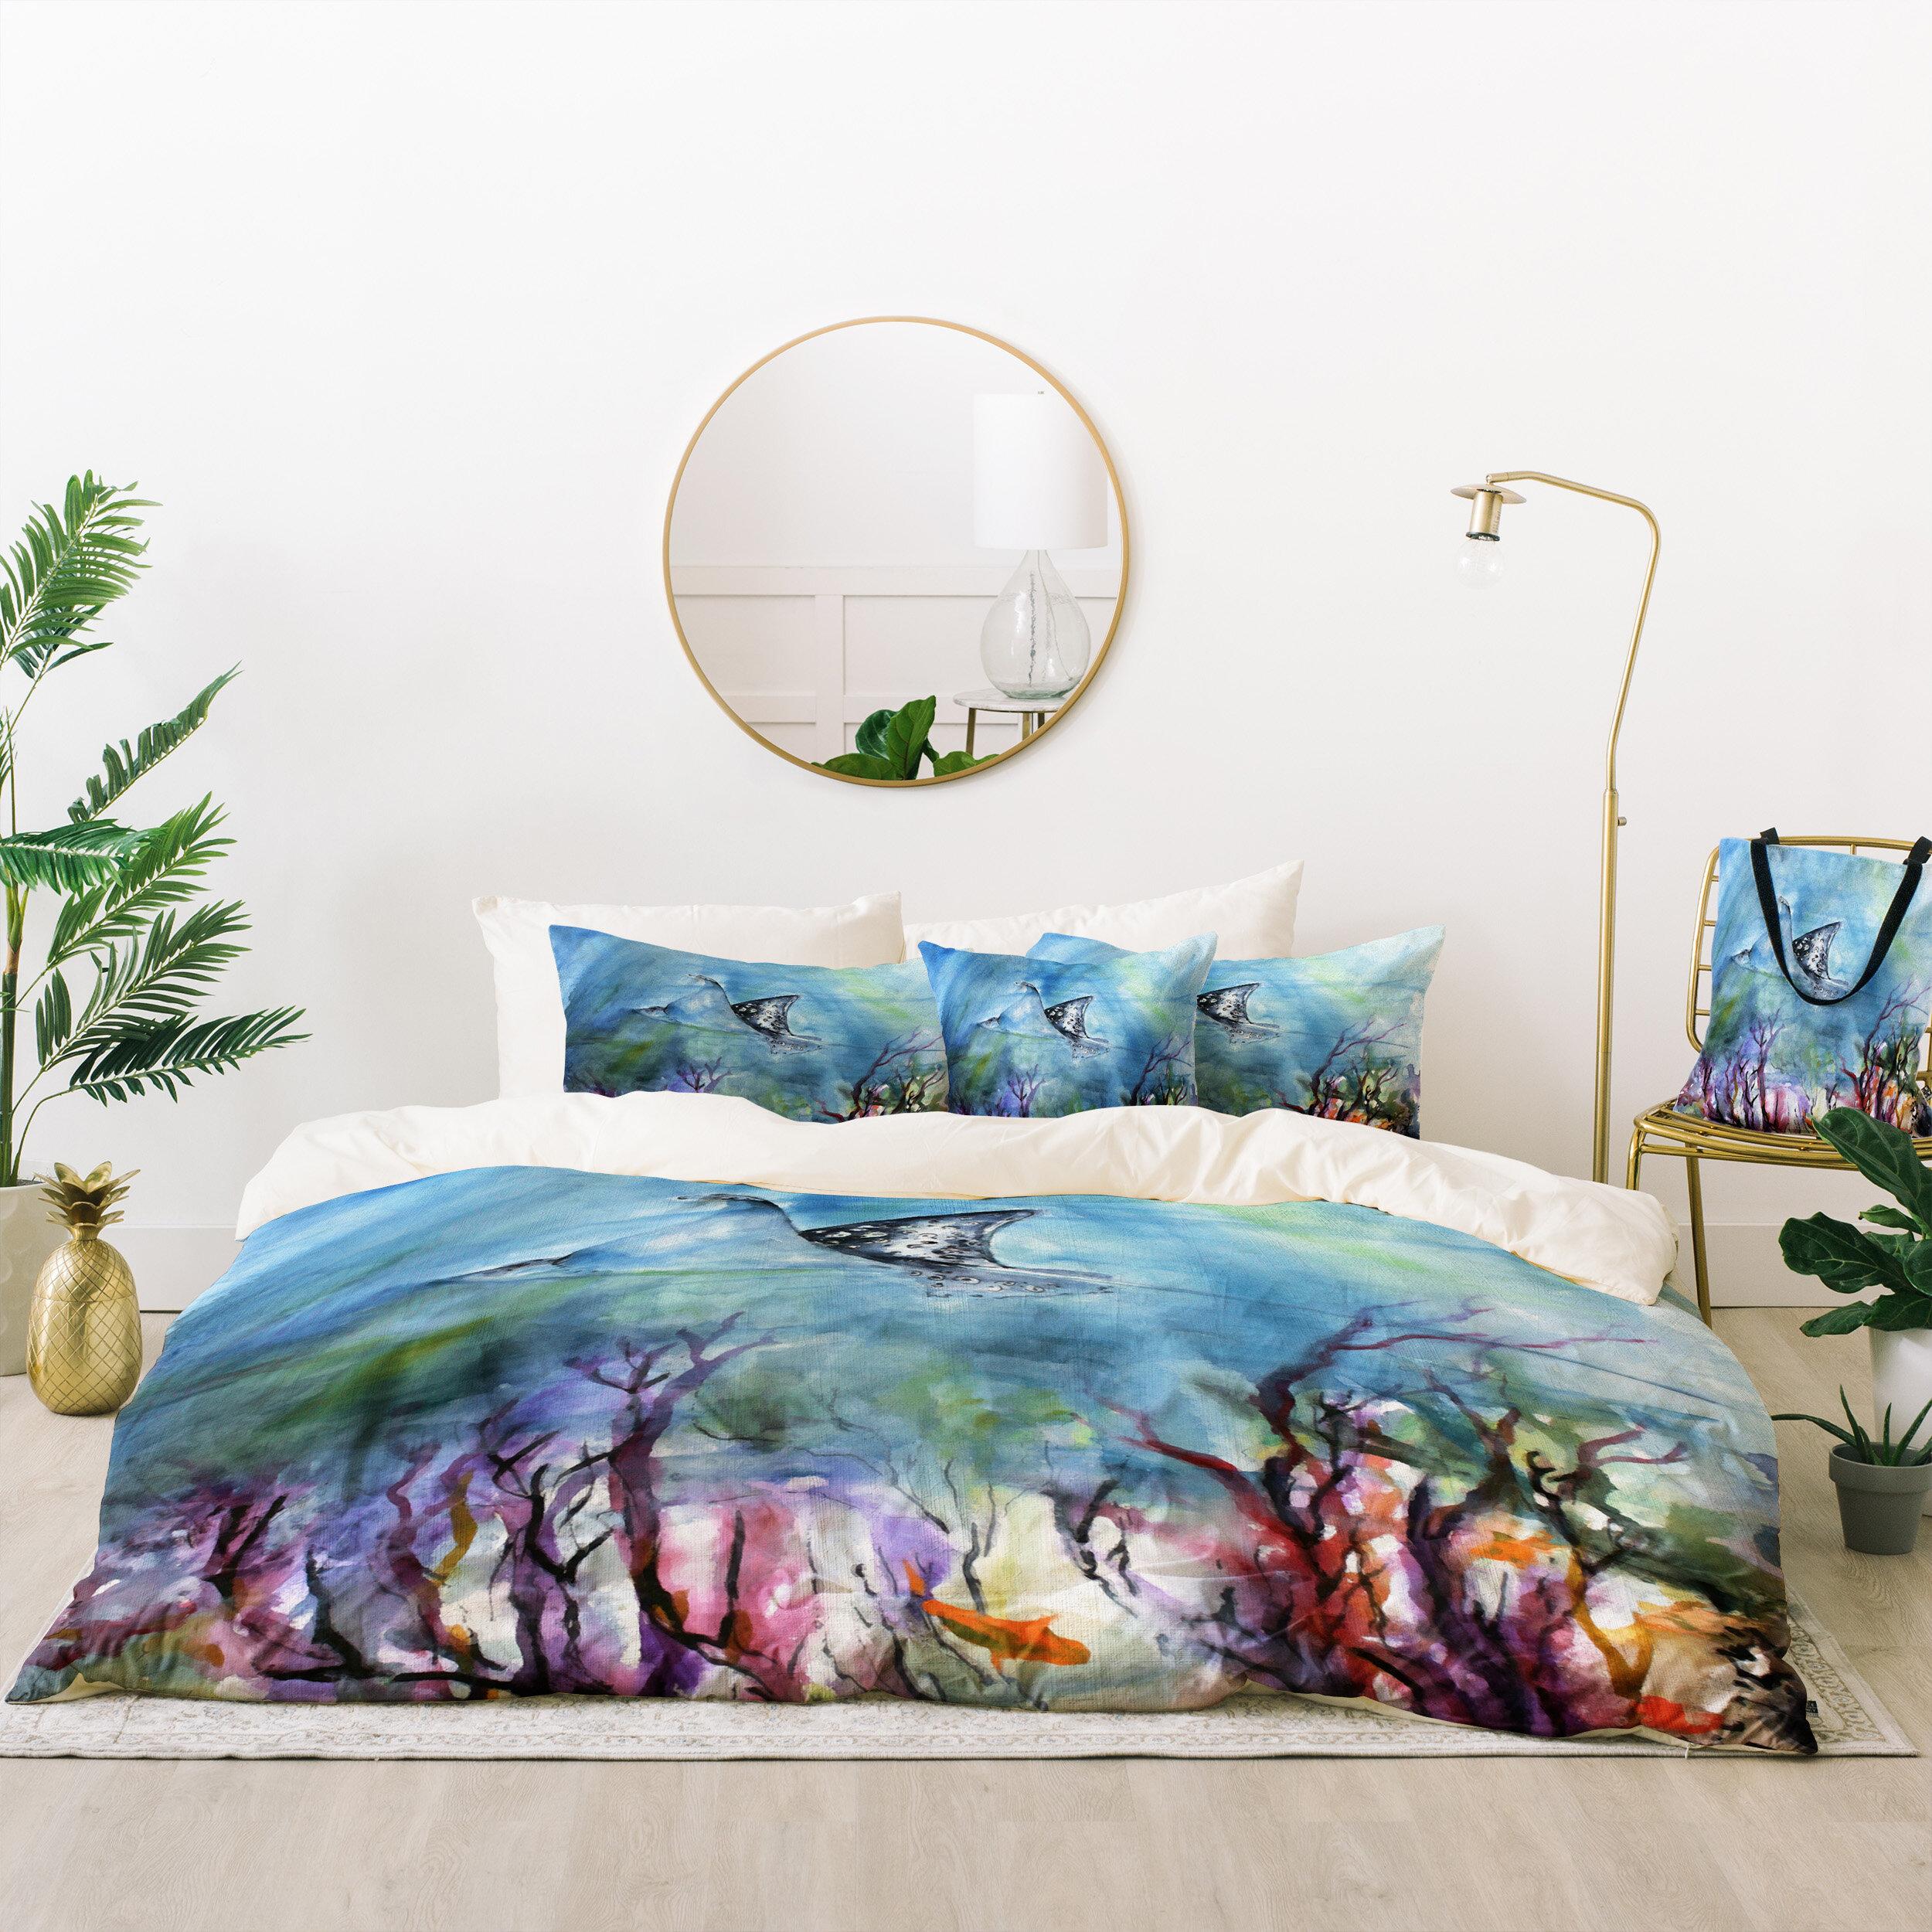 The Pillow Collection Lesly Stripes Bedding Sham Blue Grey European//26 x 26